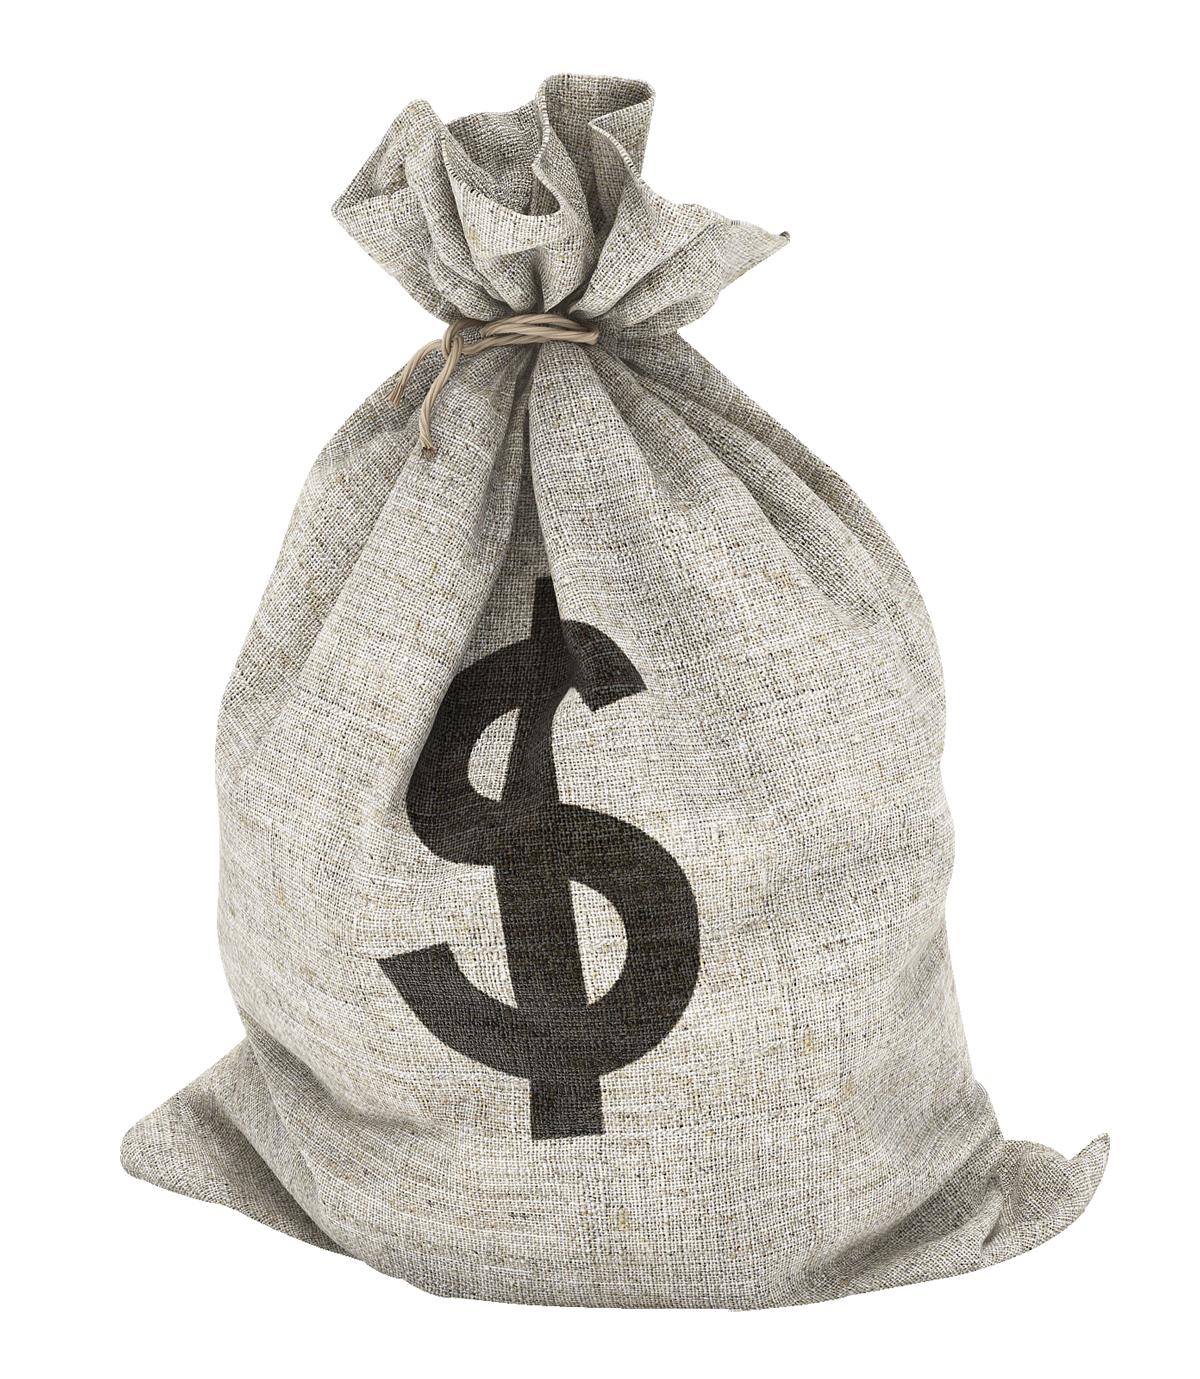 Image purepng free transparent. Bag of money png